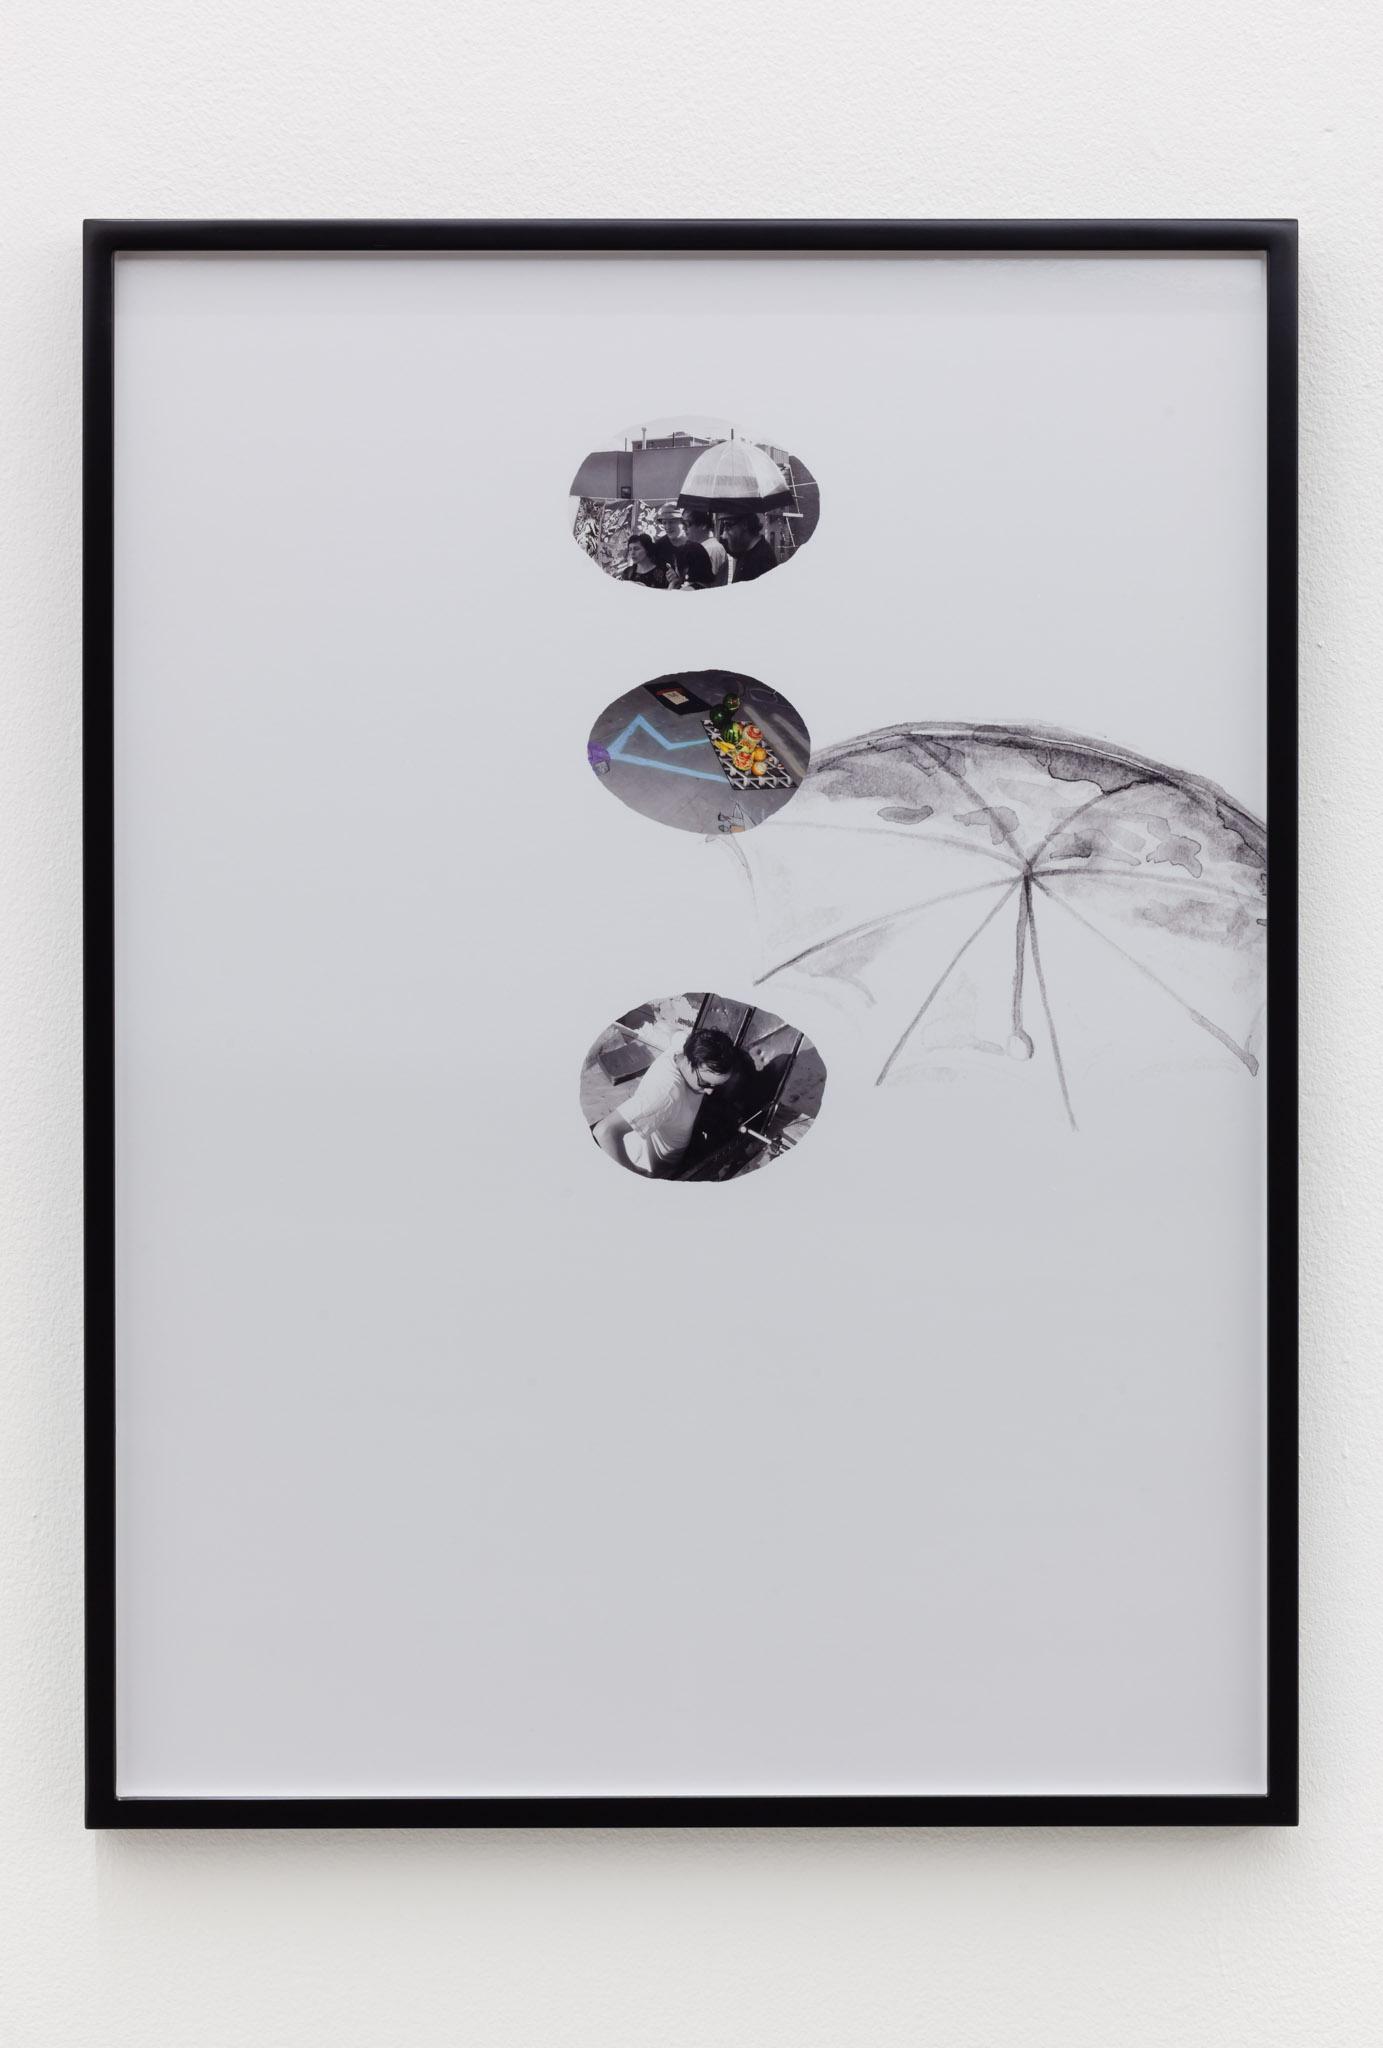 Motif, 2014, Framed print, 62.5 x 47 cm, 24.61 x 18.5 ins. House of Gaga presents Single Moms